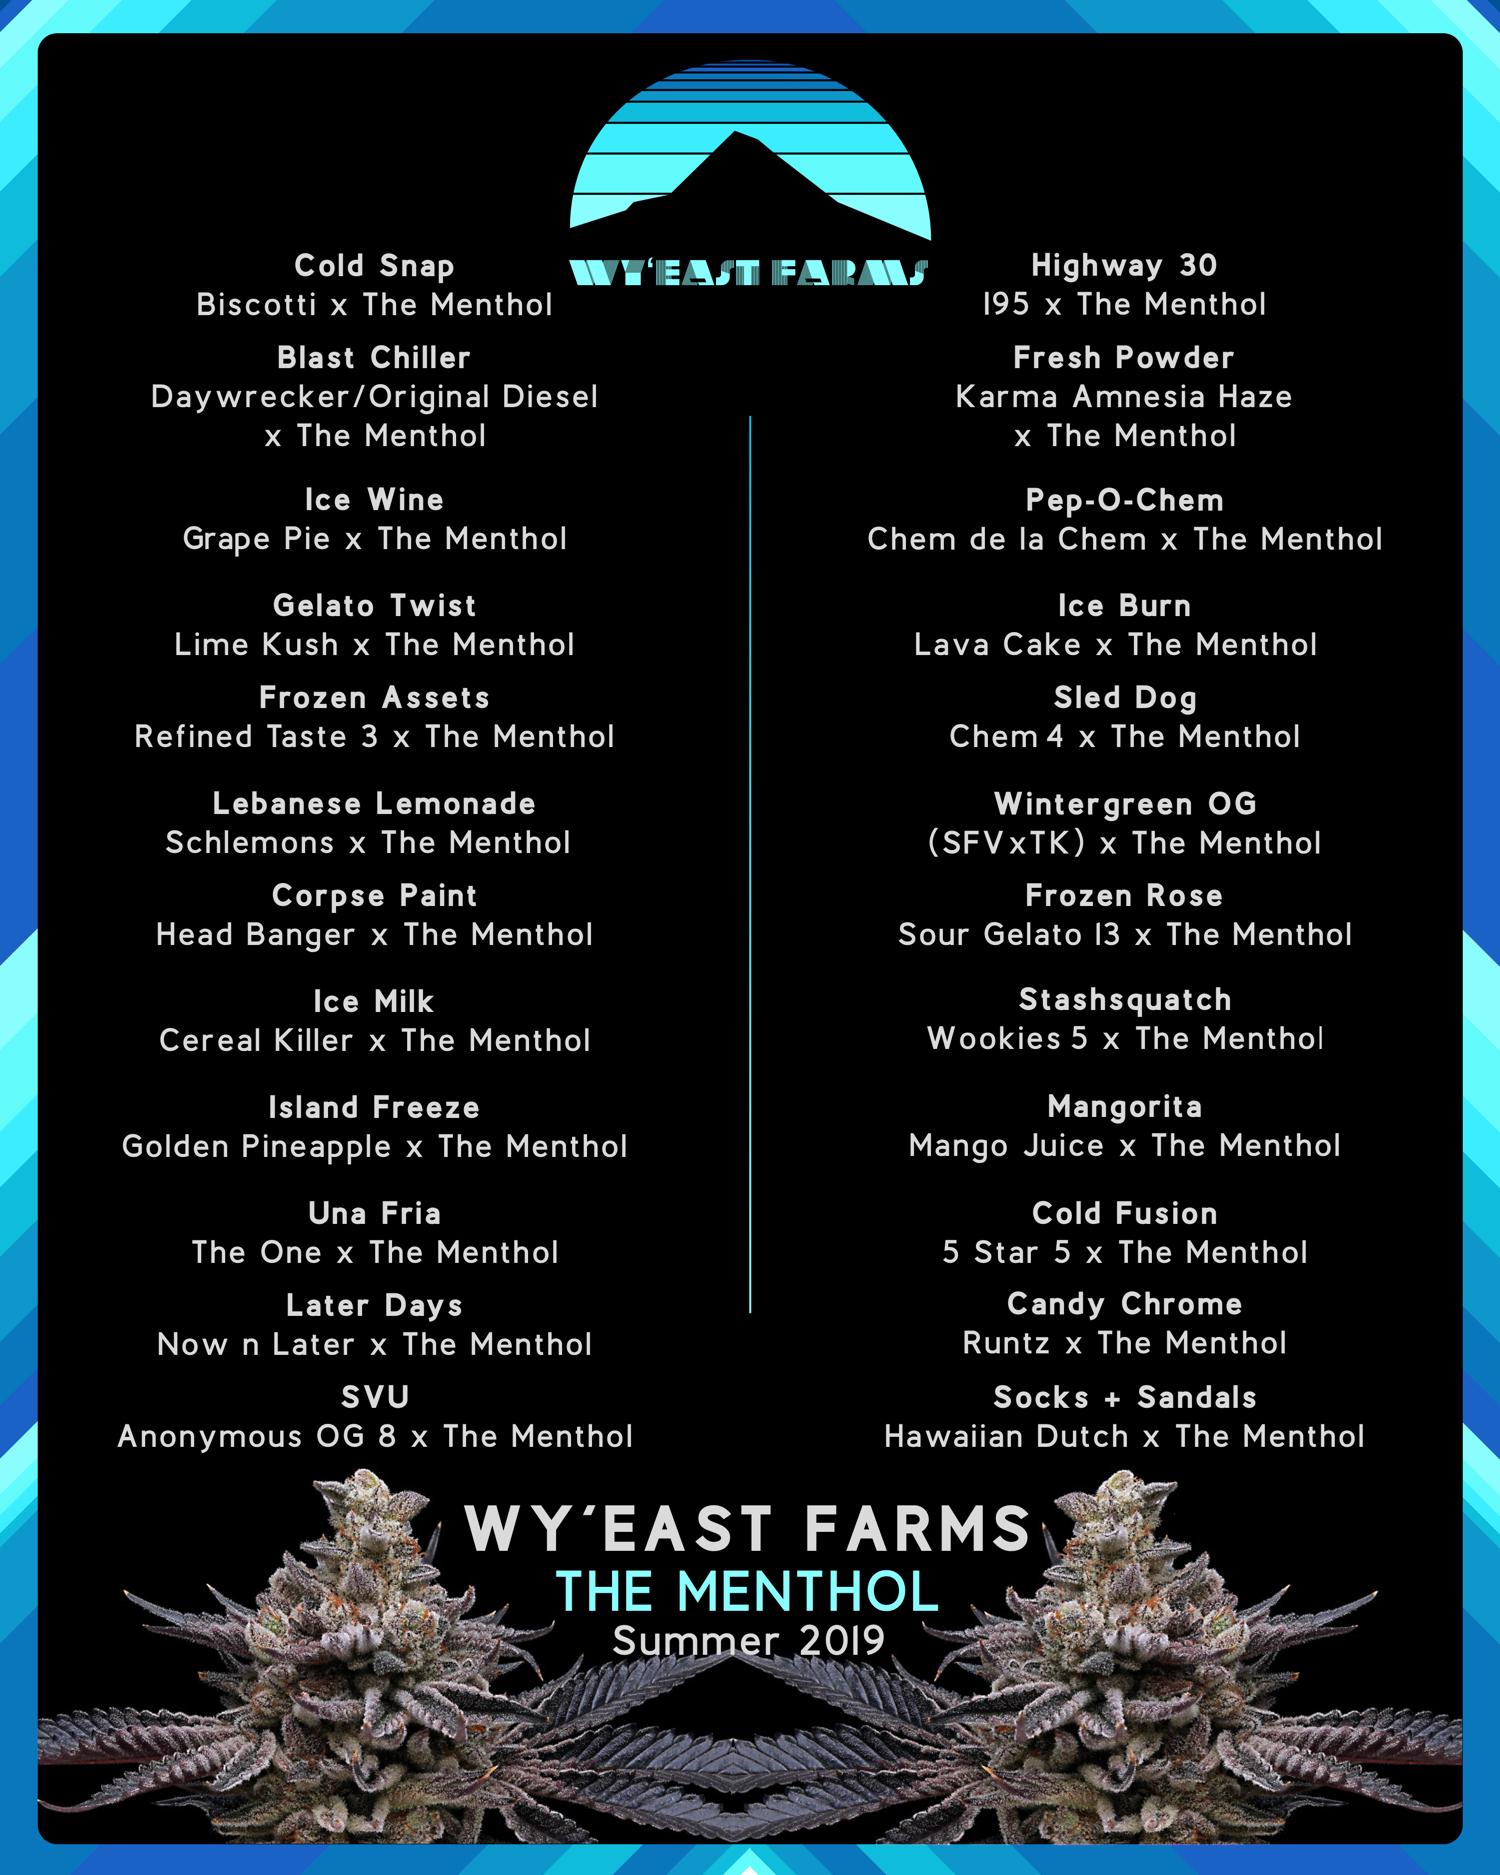 Wy'East Farms - The Menthol - menu Summer 2019